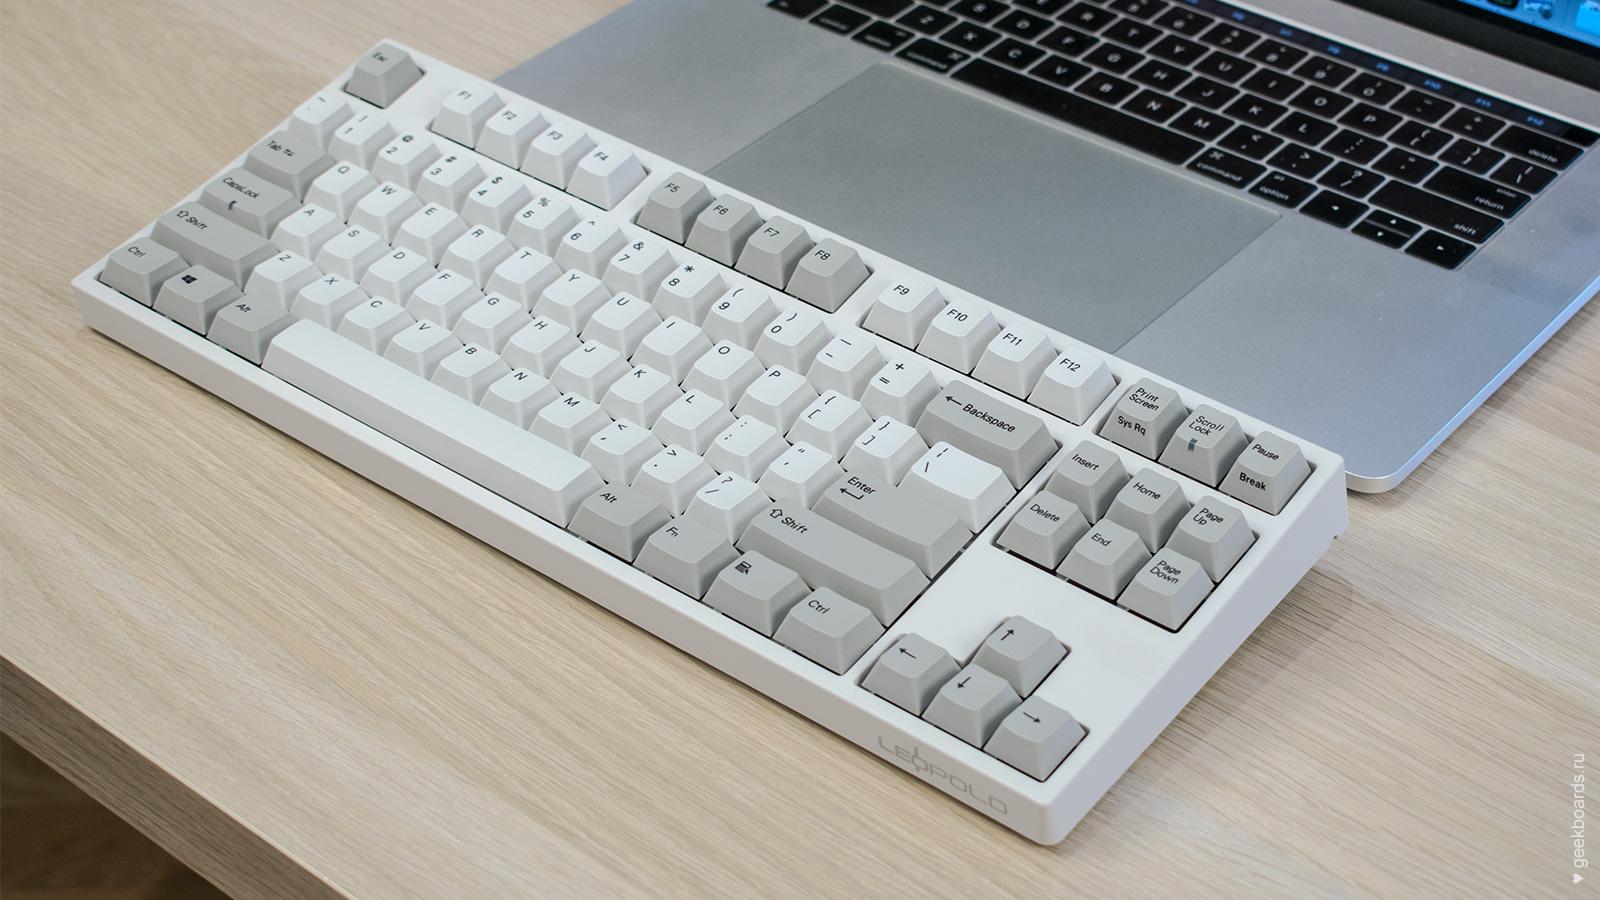 Leopold FC750R PS